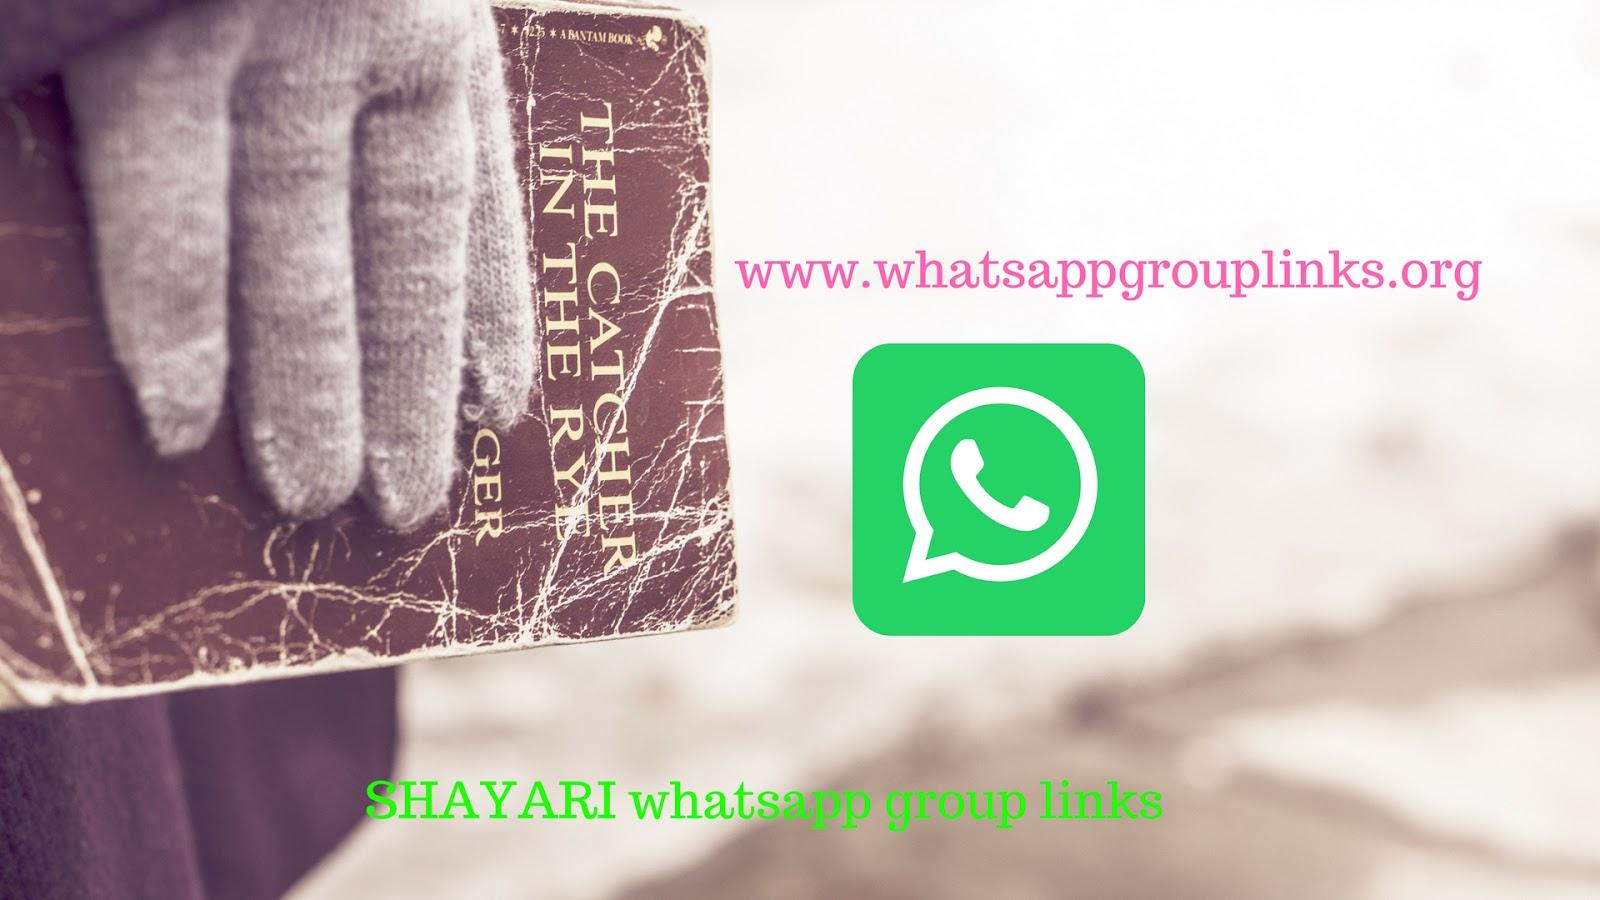 JOIN SHAYARI WHATSAPP GROUP LINKS LIST - Whatsapp Group Links